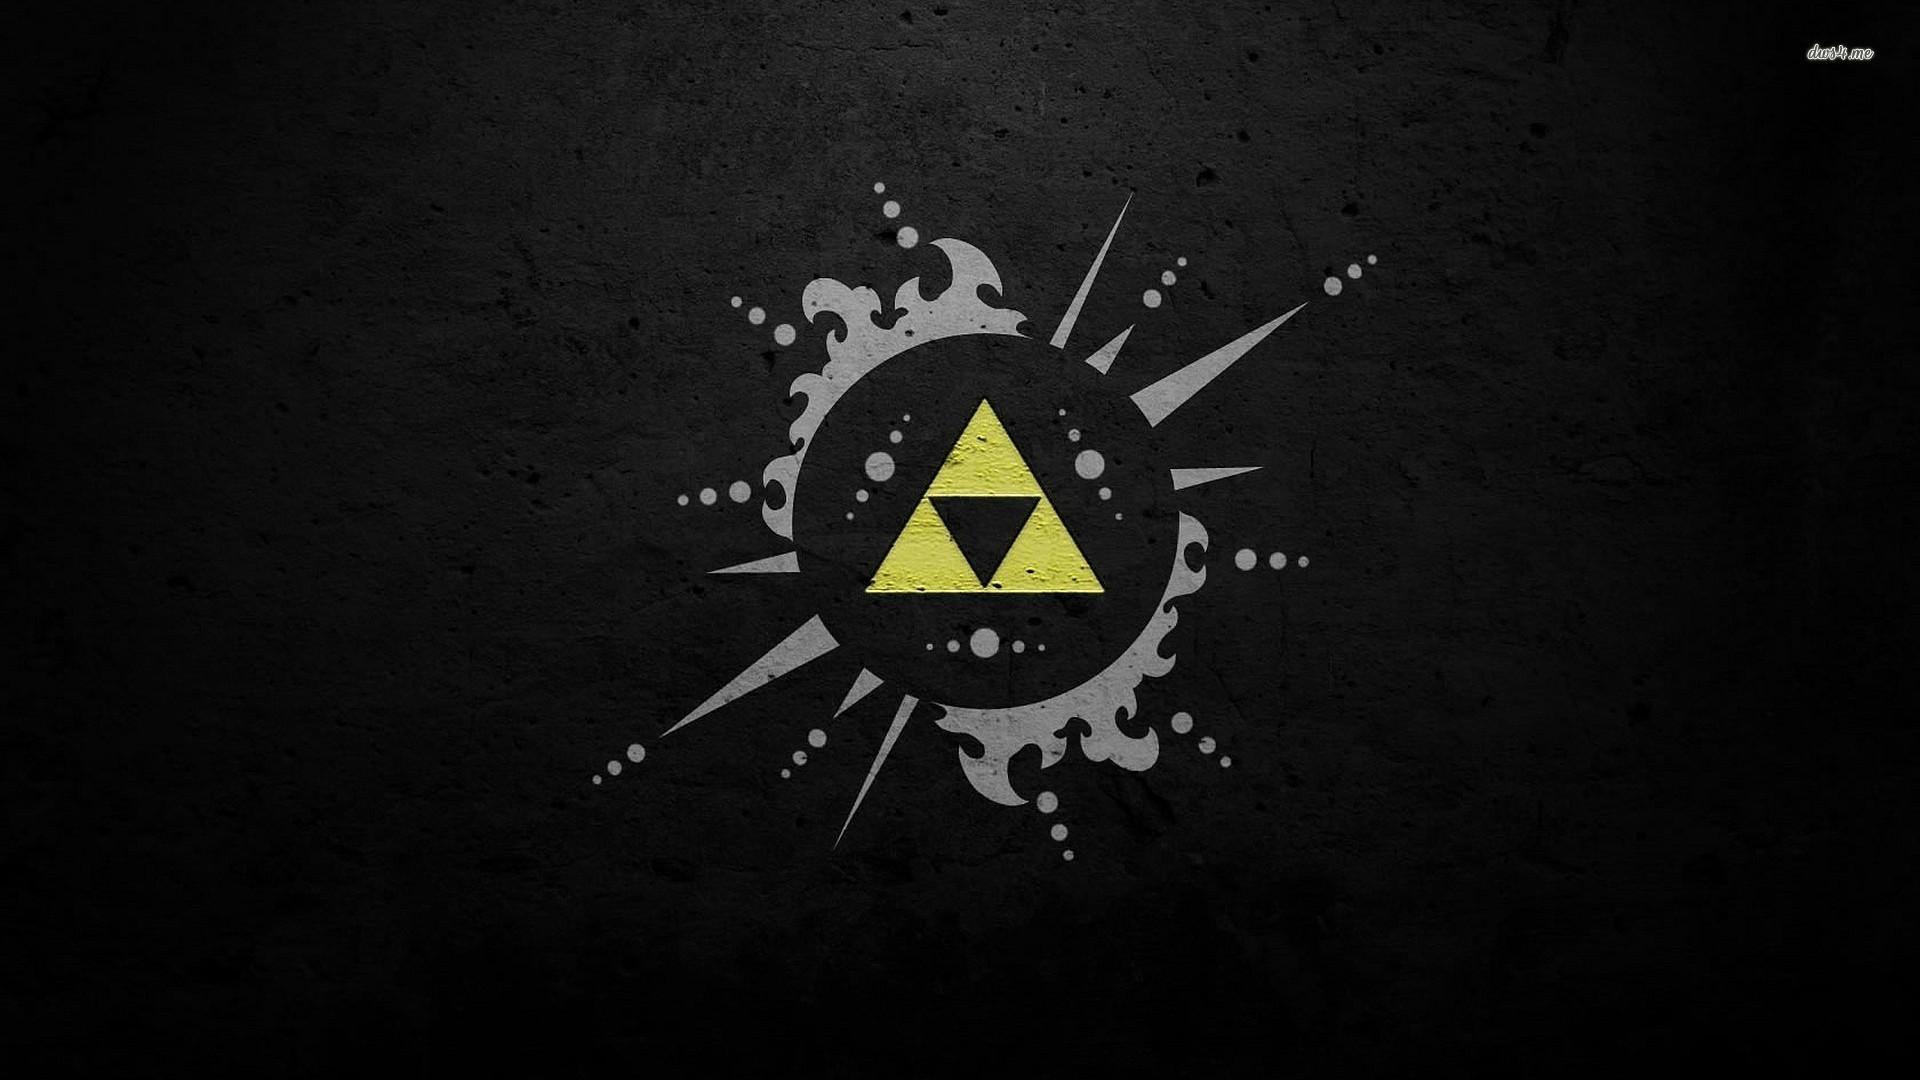 Triforce – The Legend of Zelda wallpaper – Game wallpapers – #8038